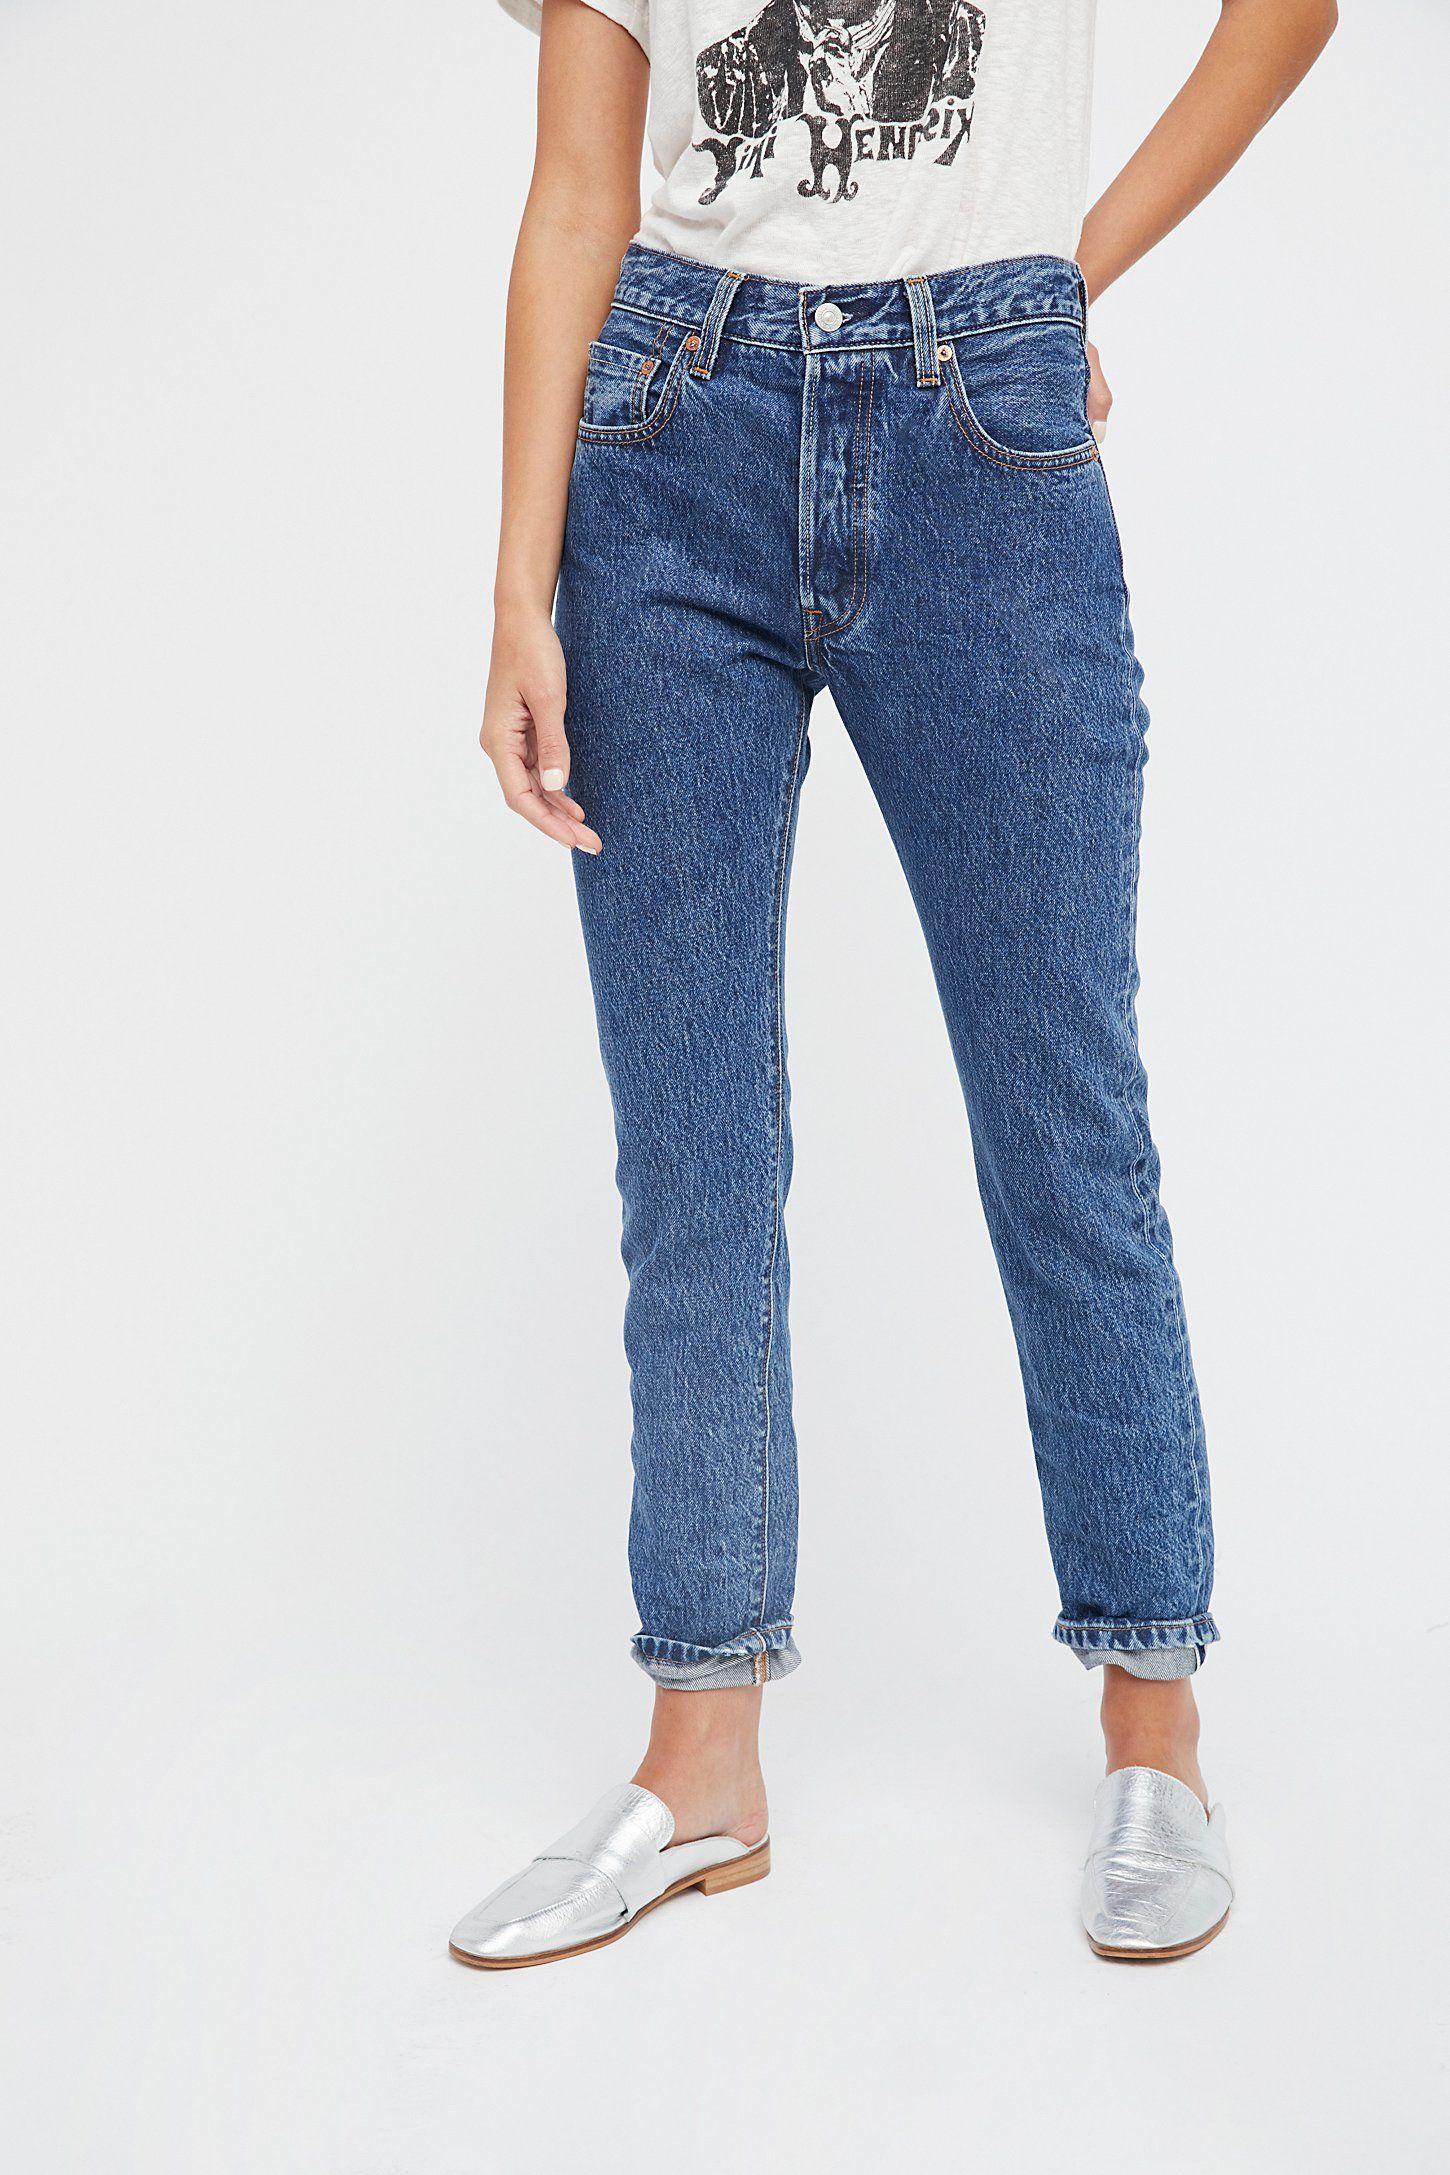 f6f878ea Levi's 501 Skinny Selvedge Jeans | Products I Love | Jeans, Skinny ...